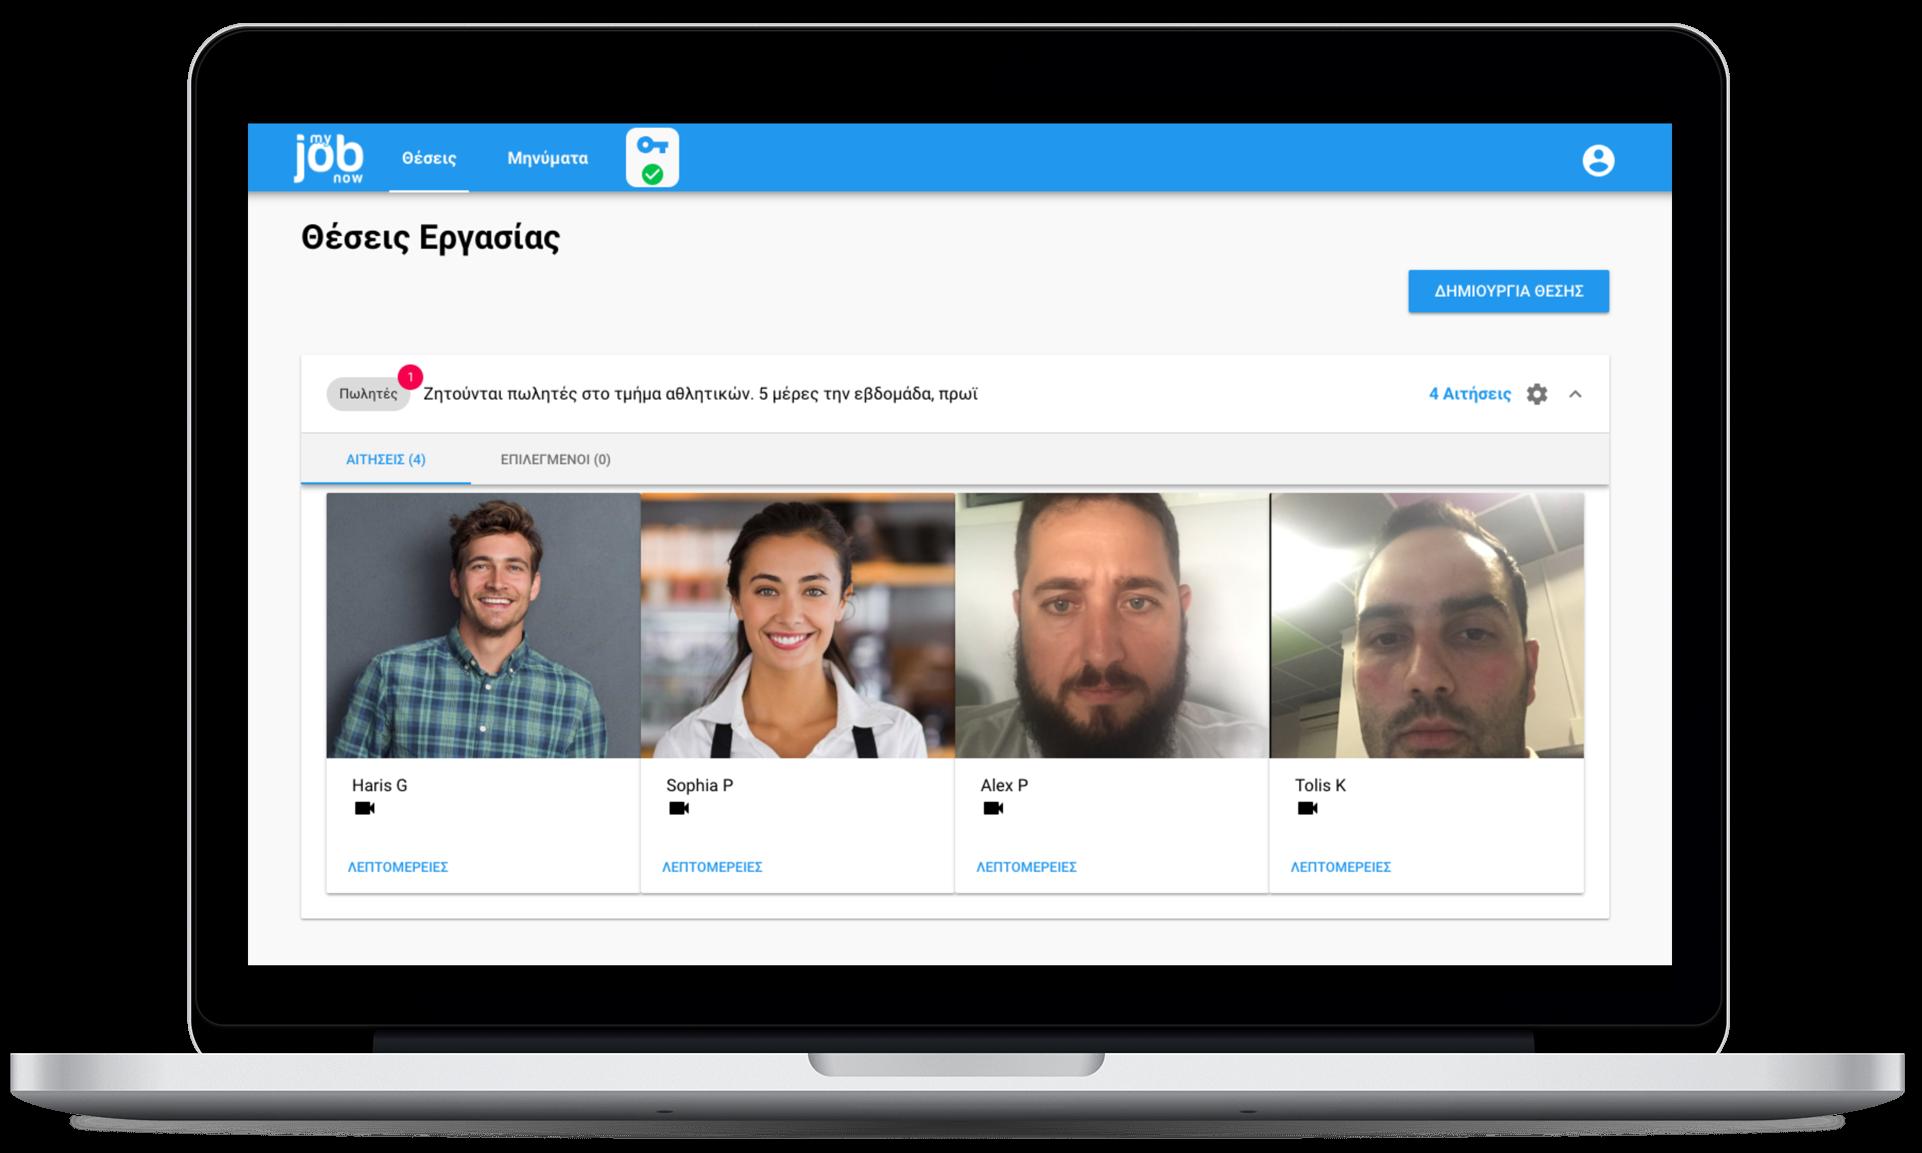 MyJobNow employer desktop